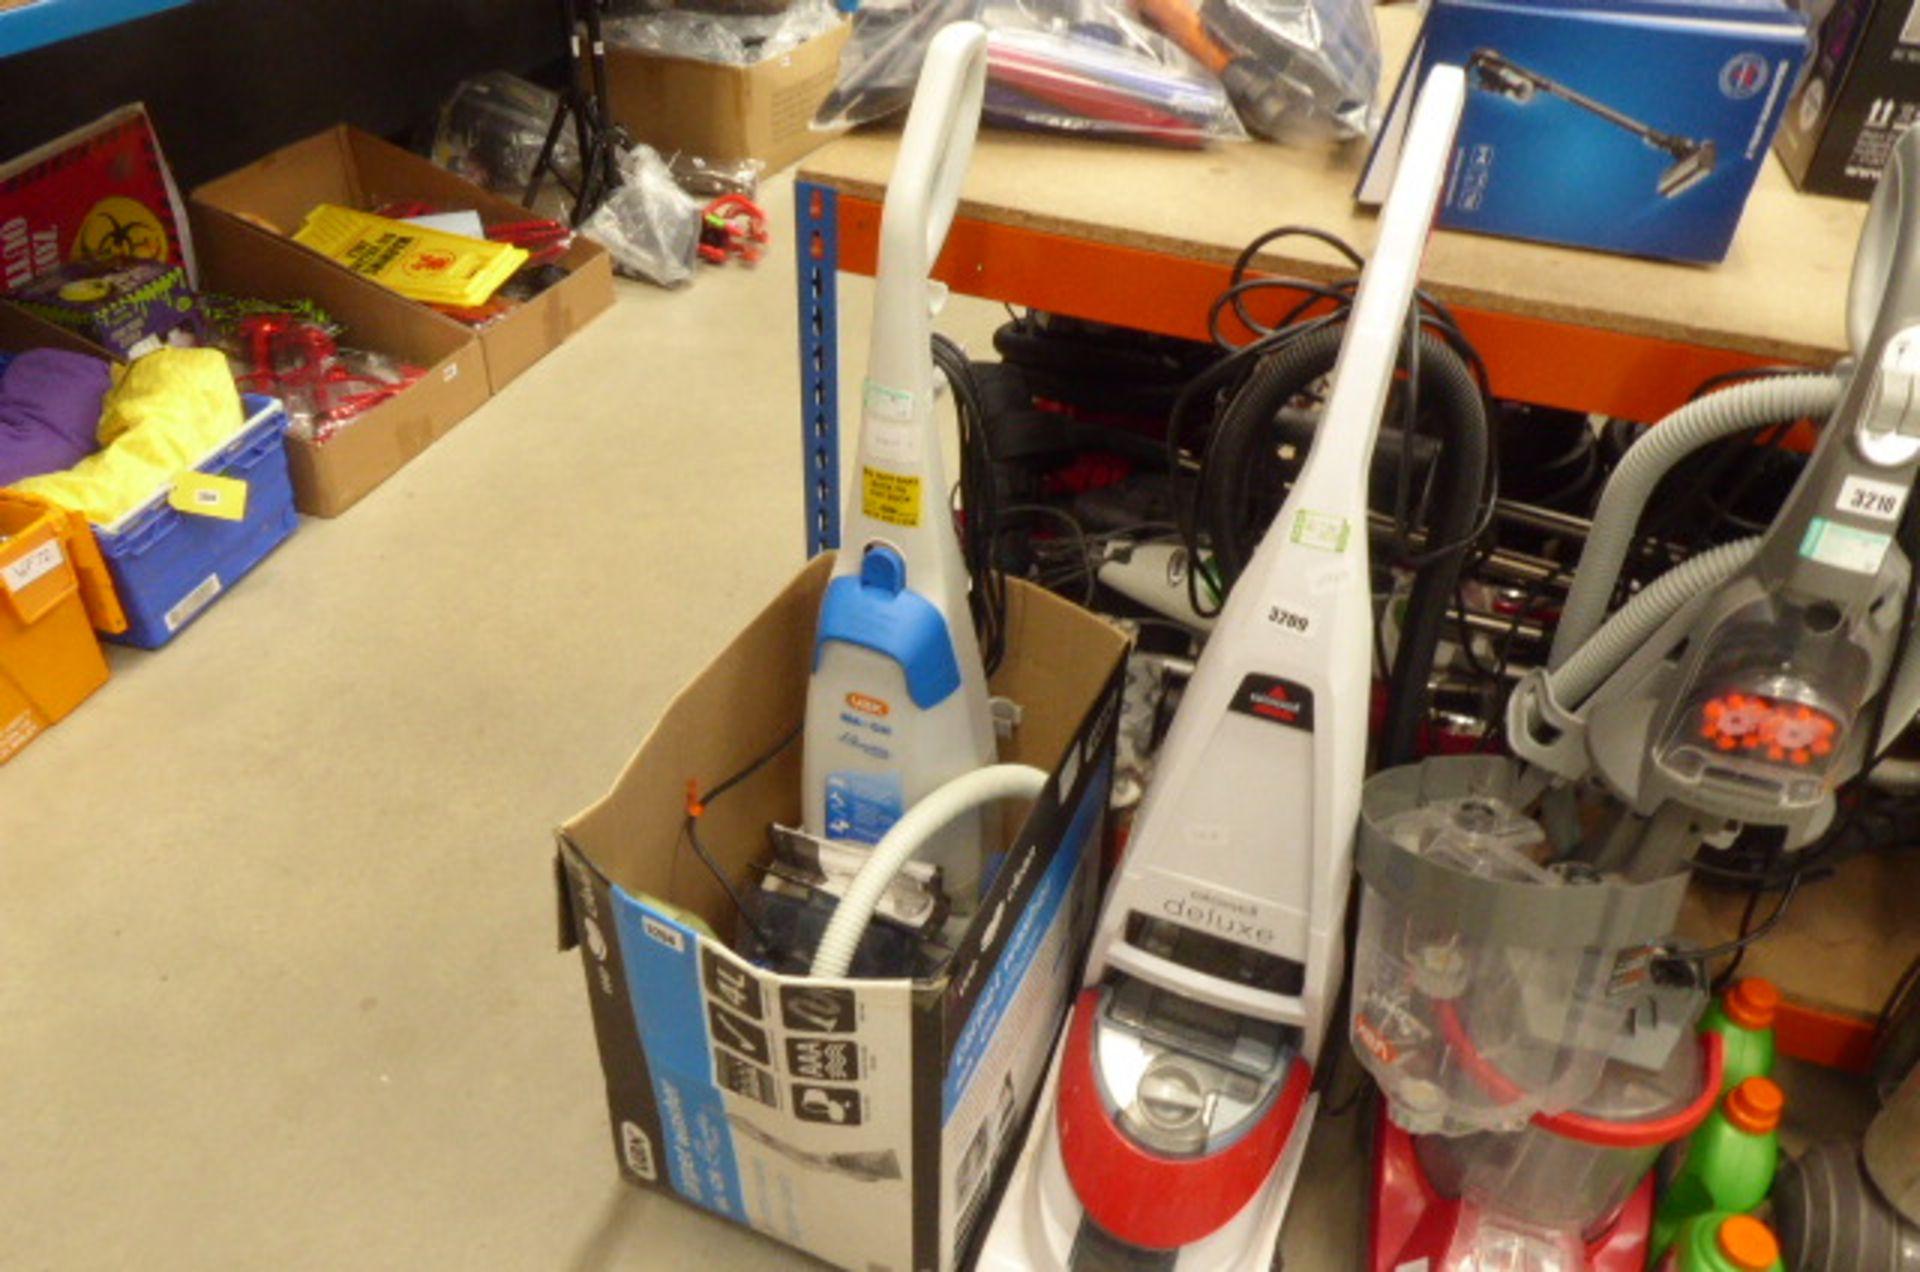 Lot 3208 - (29) Upright Vax floor cleaner